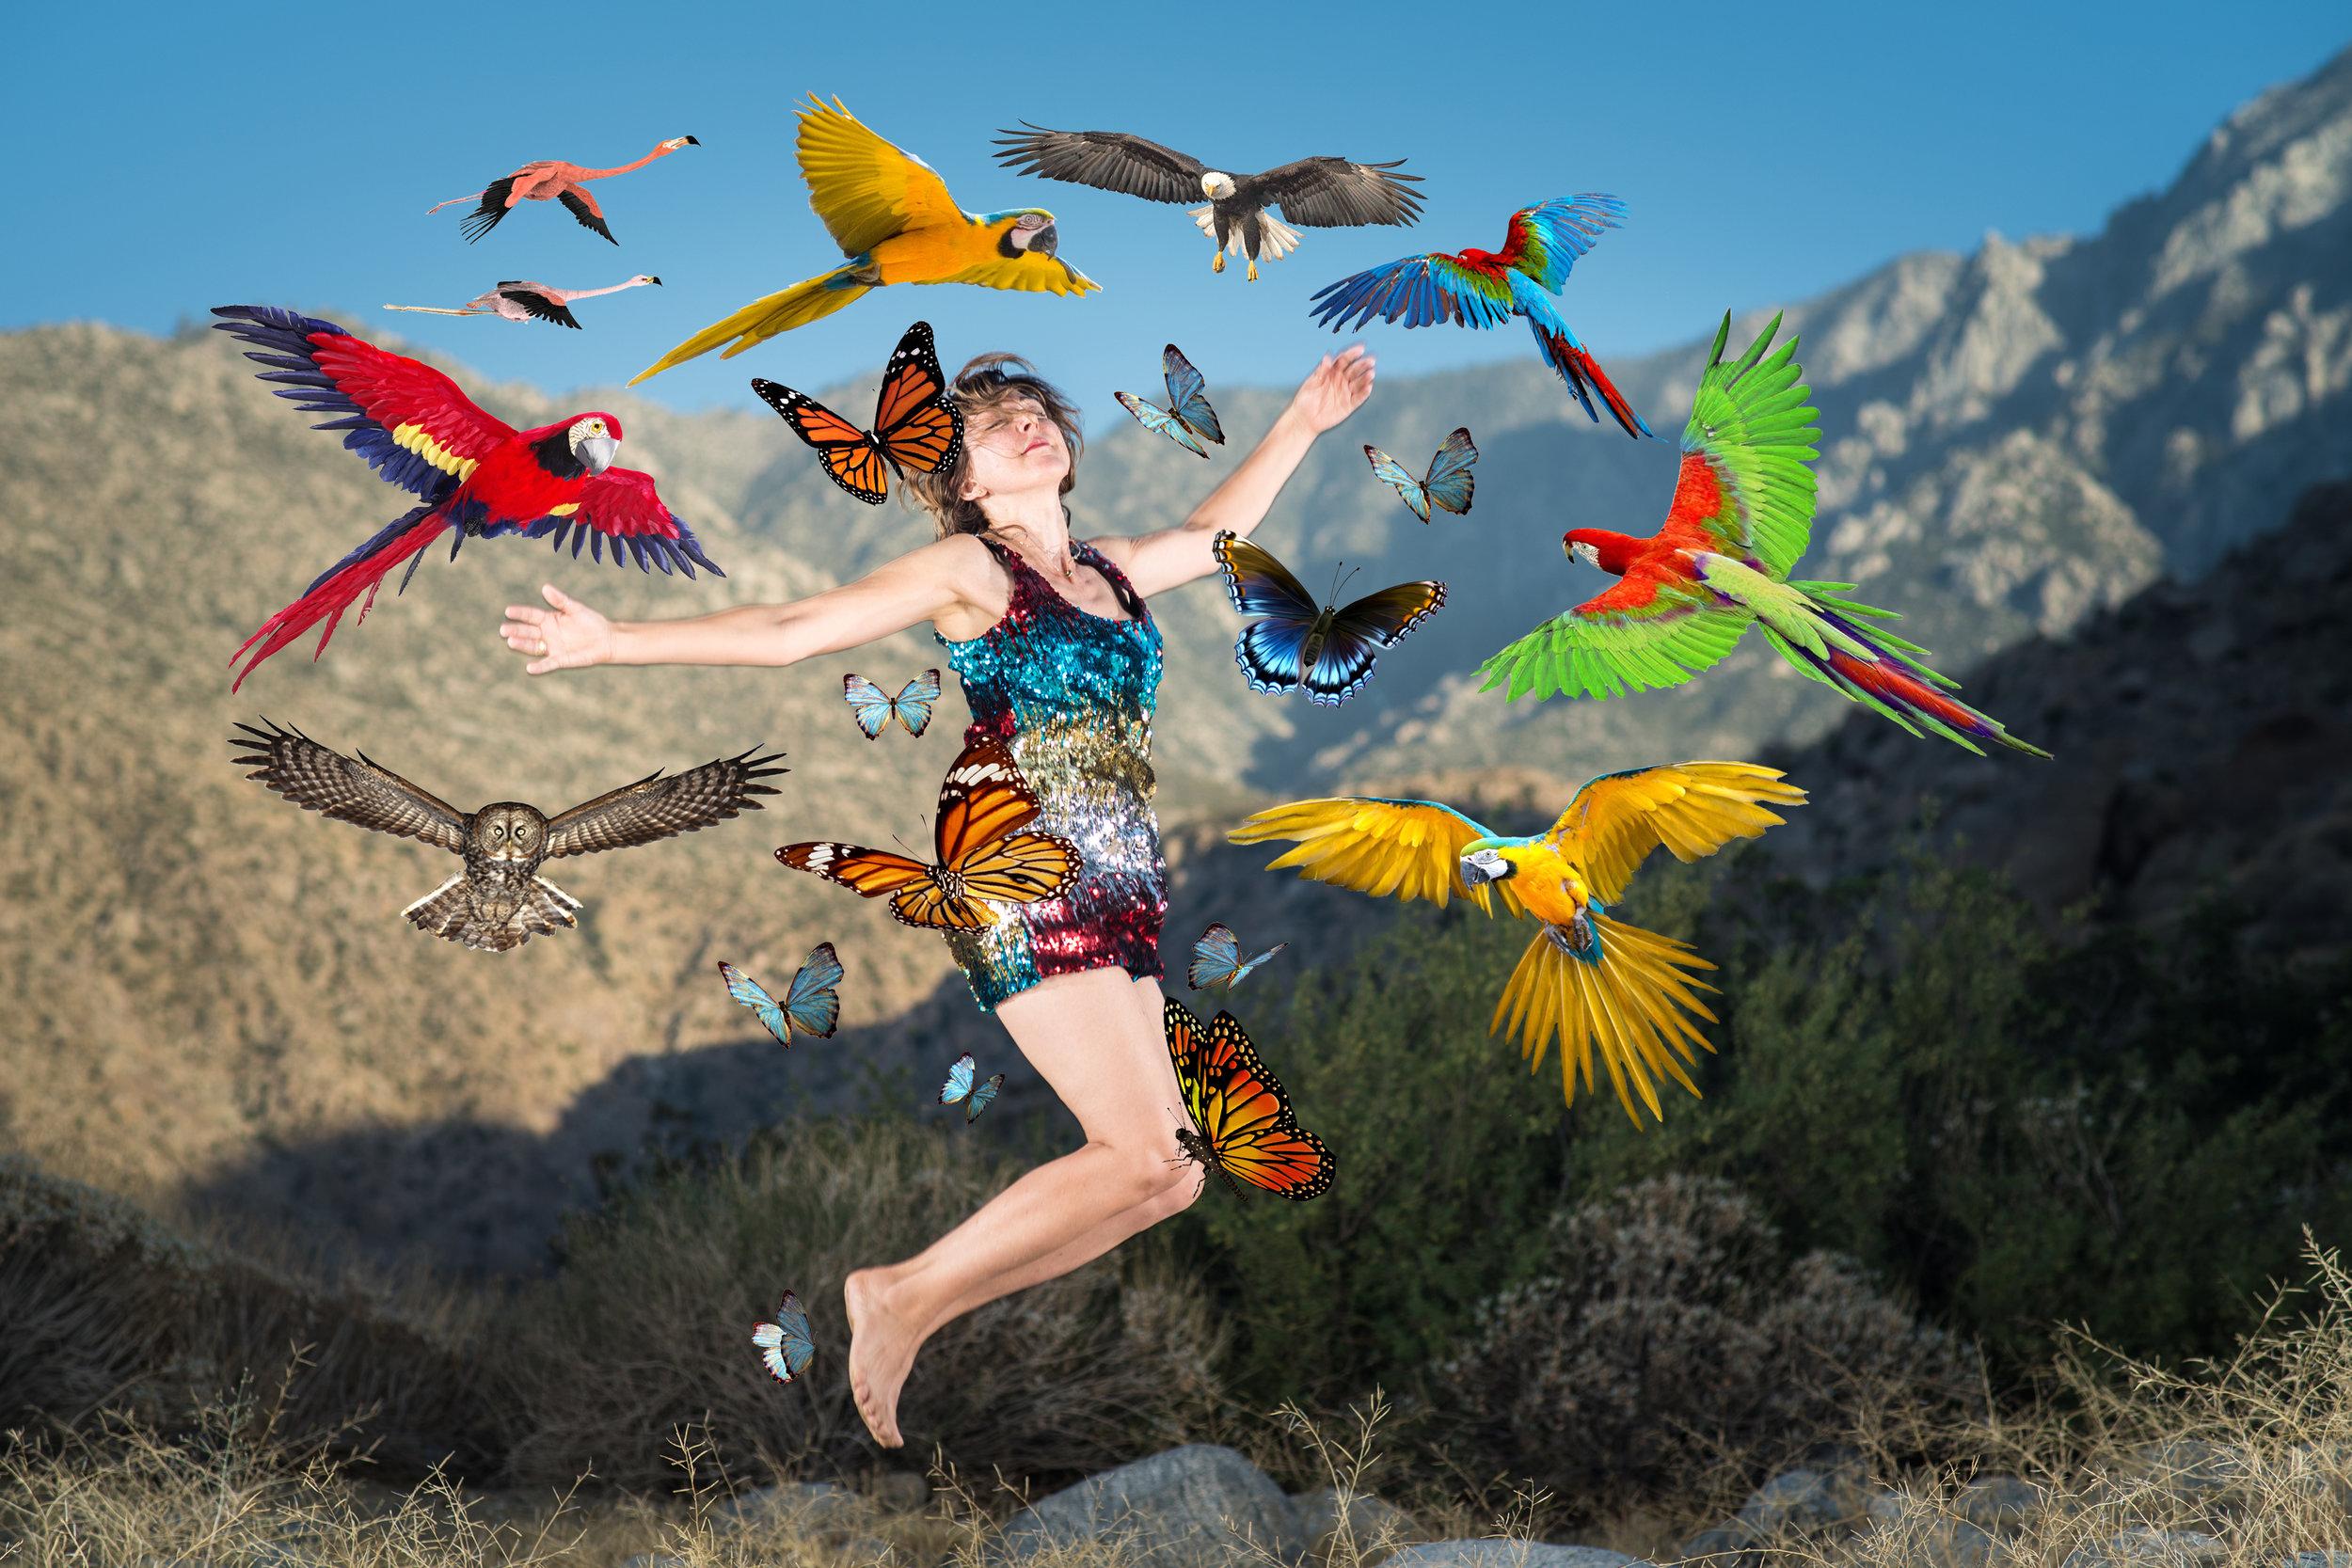 SparkleJump with birds_5616_B.jpg